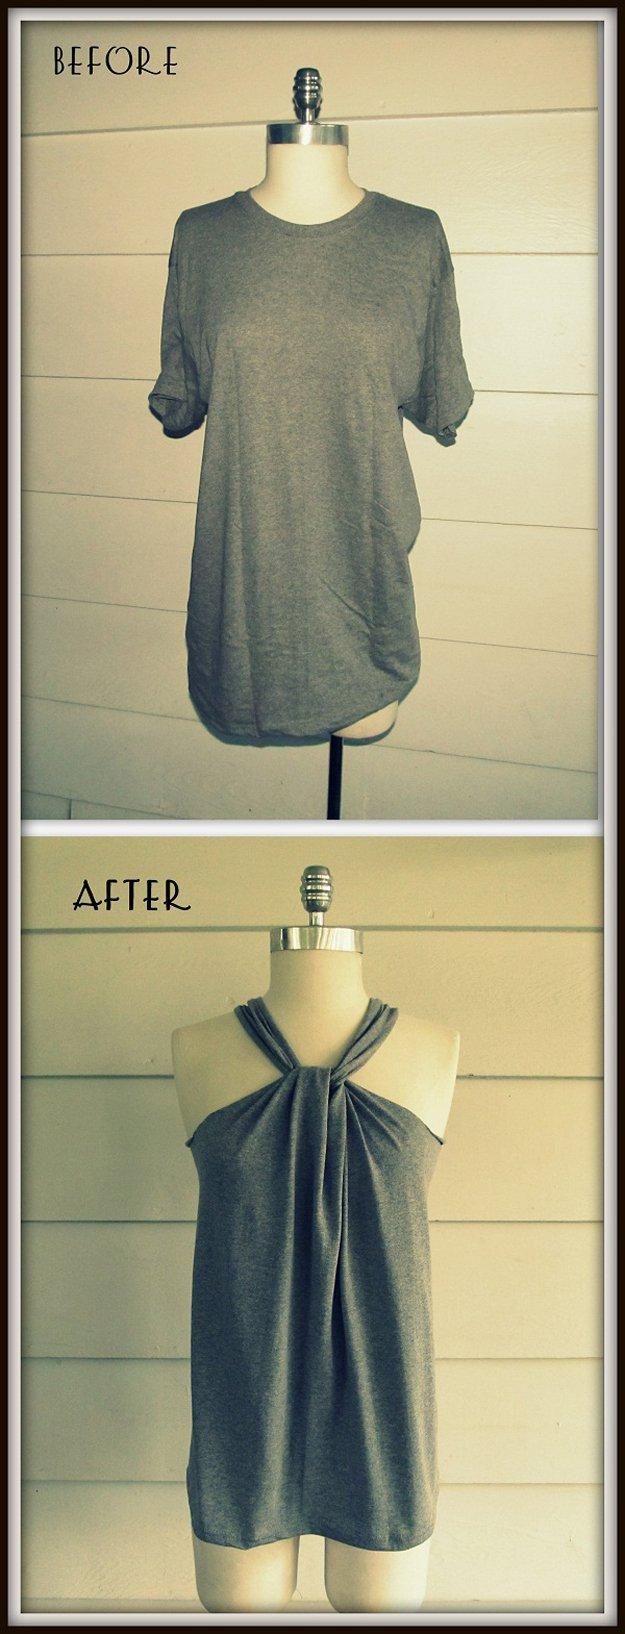 Easy Haltered DIY Top Design | diyready.com/diy-clothes-sewing-blouses-tutorial/